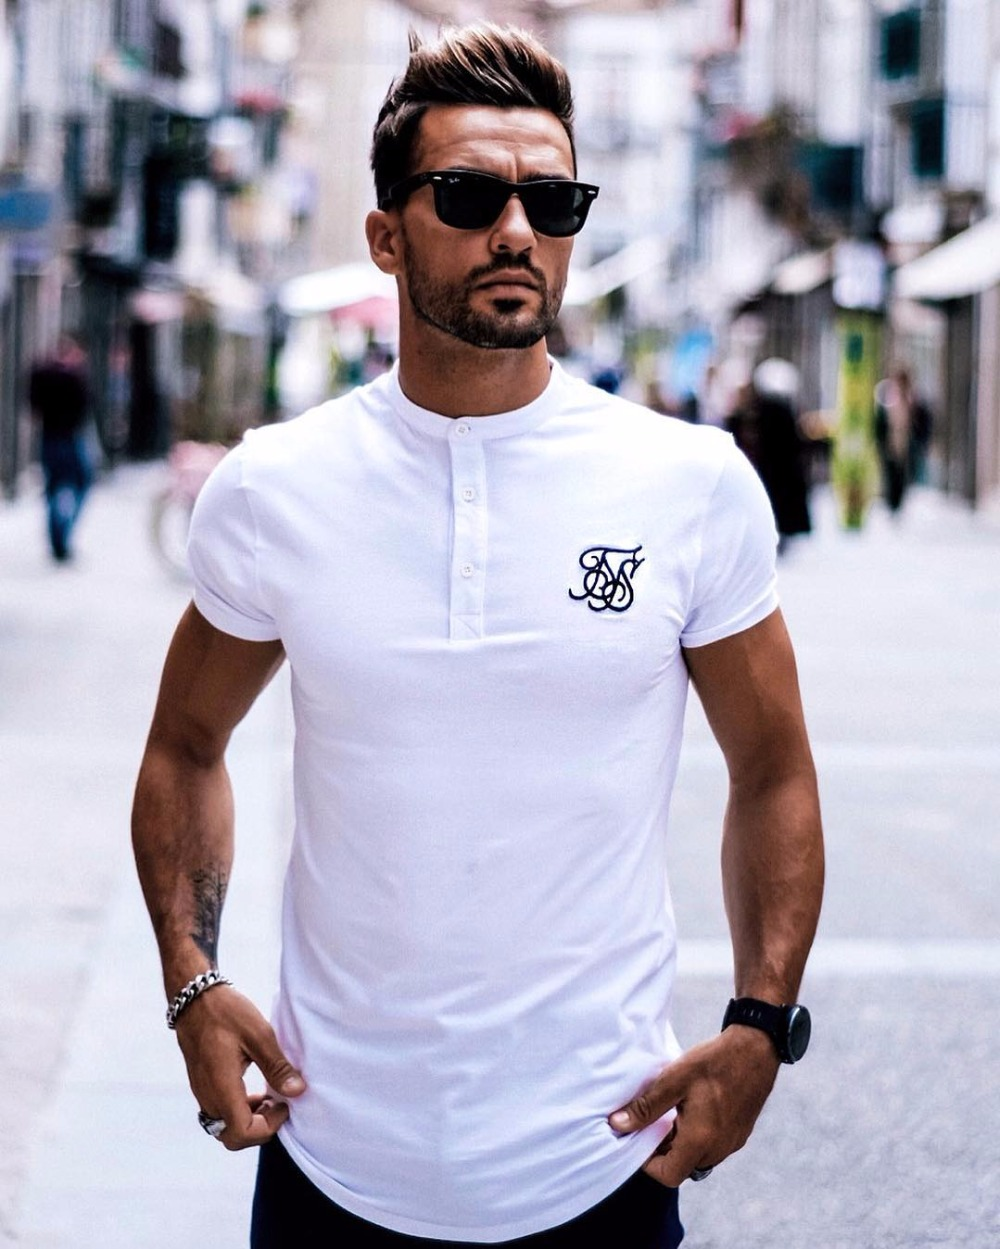 New Men Brand Fashion Summer Kanye West Sik Silk Men Casual Hip Hop Irregular cut Button Short Sleeved T shirt Black White-in T-Shirts from Men's Clothing